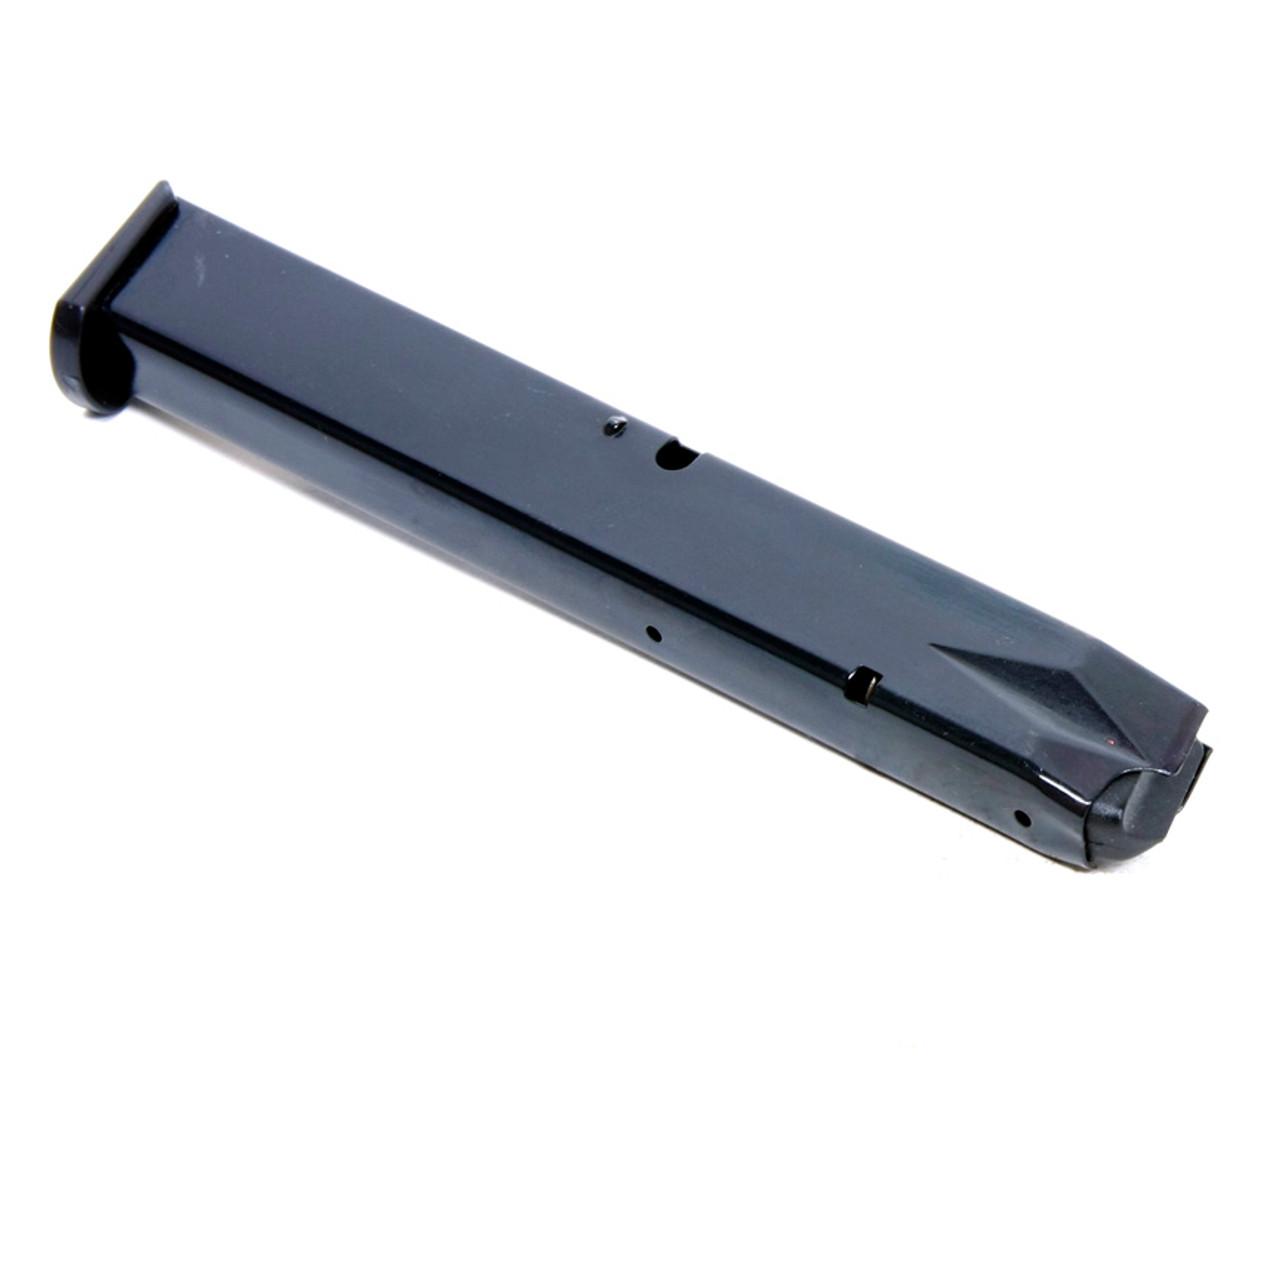 Taurus® PT-92 9mm (32) Rd - Blue Steel